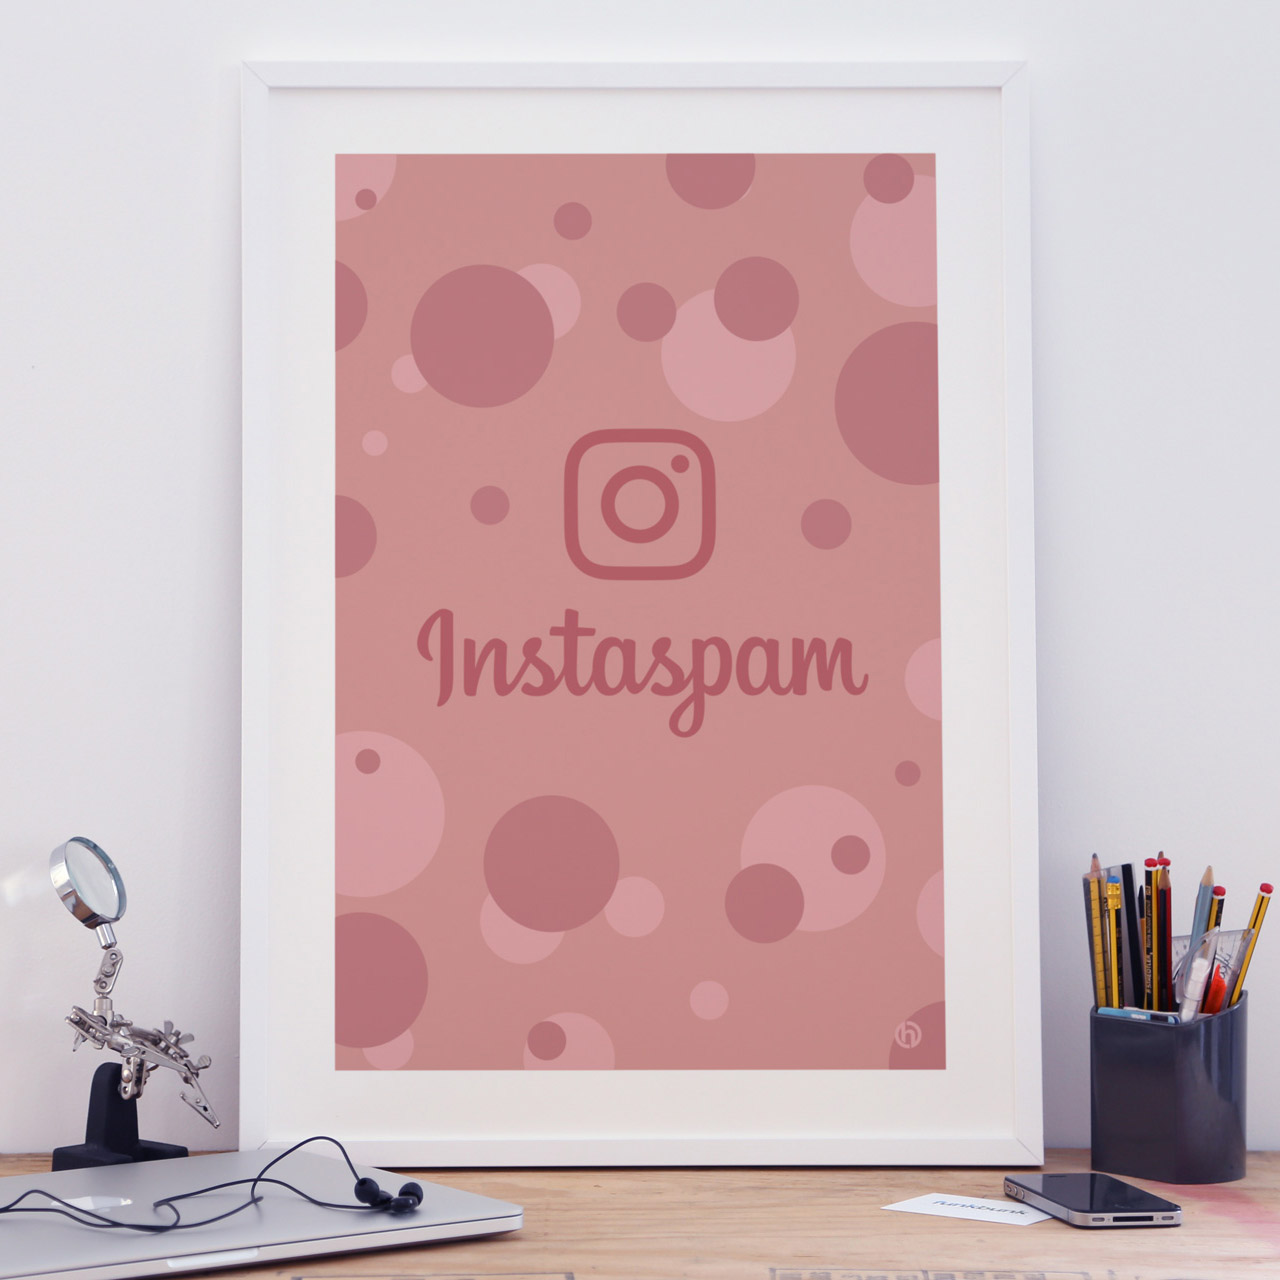 Instaspam Instagram parody art print poster